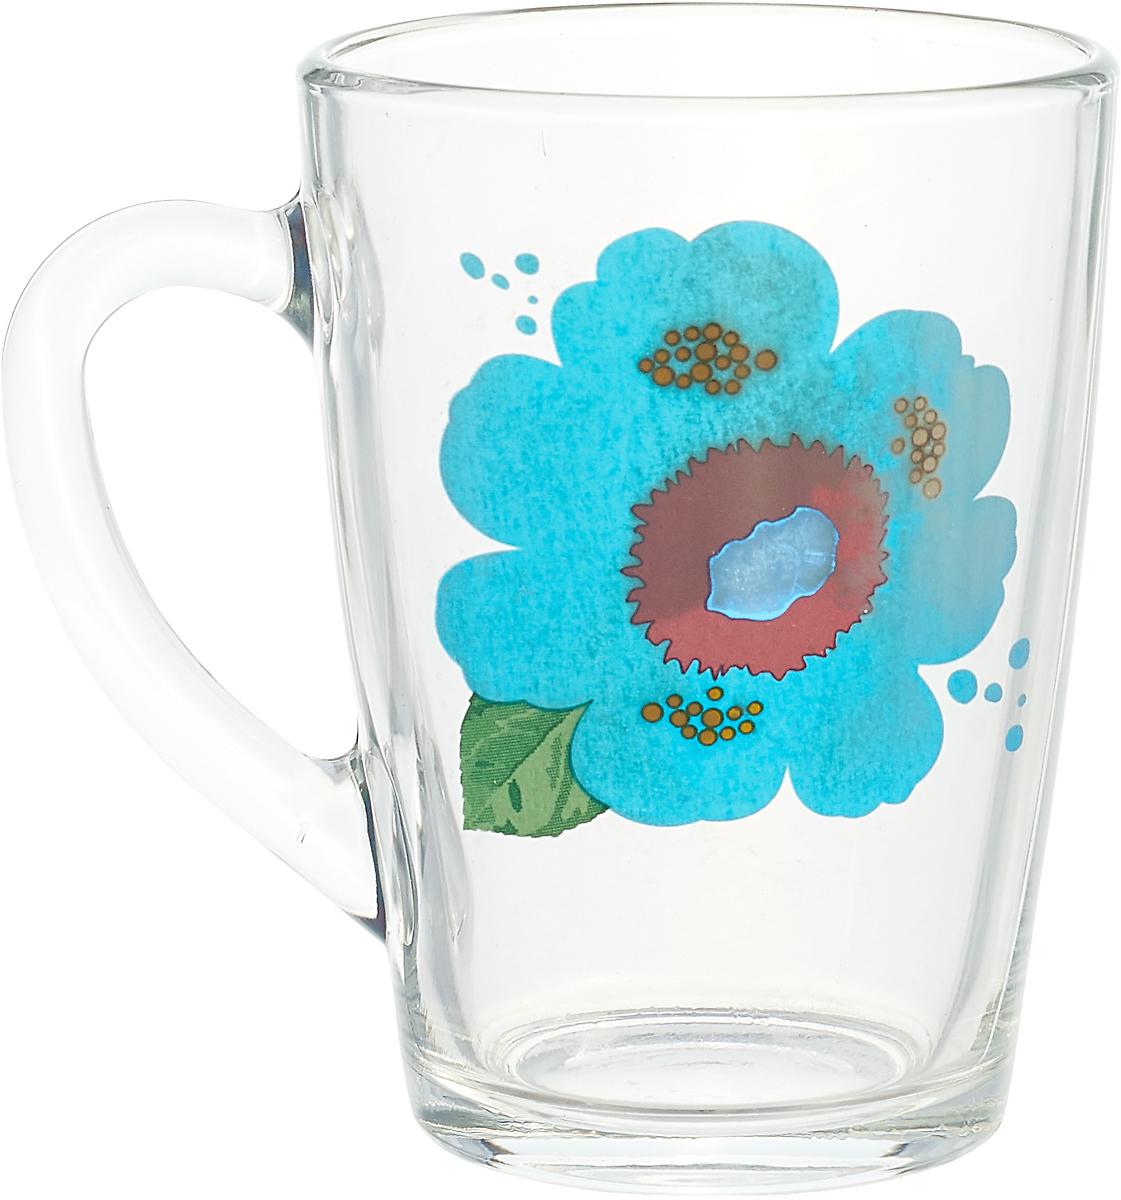 Кружка ОСЗ Чайная Яркие цветы, OCZ1334/1LTFLOW, 300 мл кружка осз чайная радужные цветы 300 мл